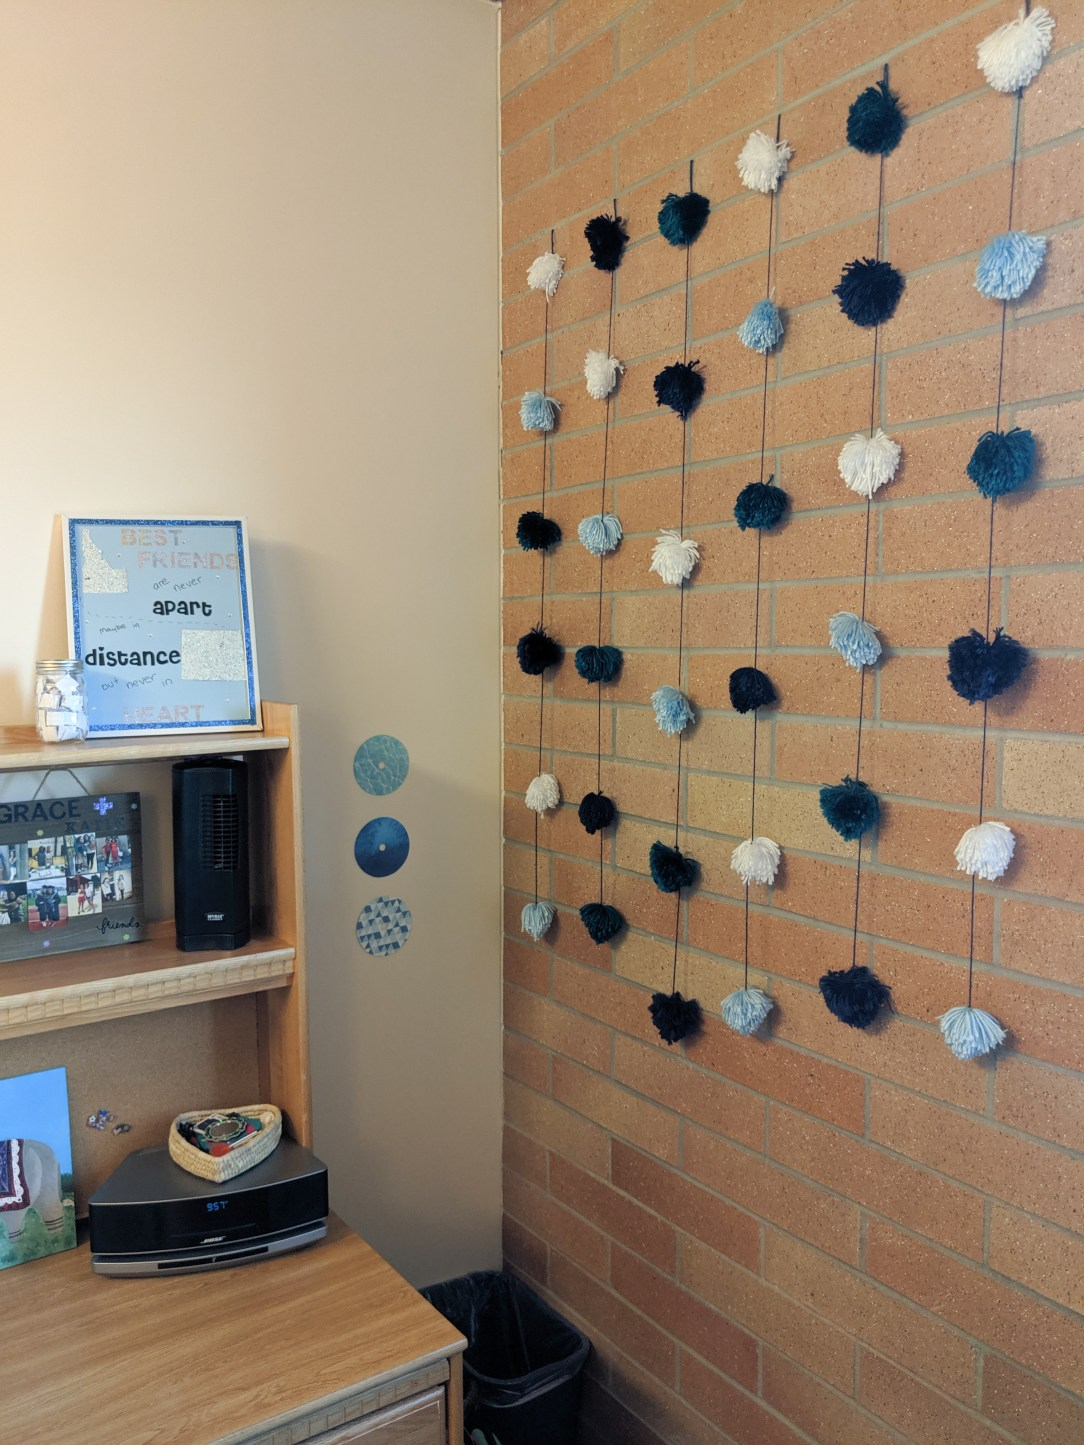 dorm room decorations, hand-made decorations